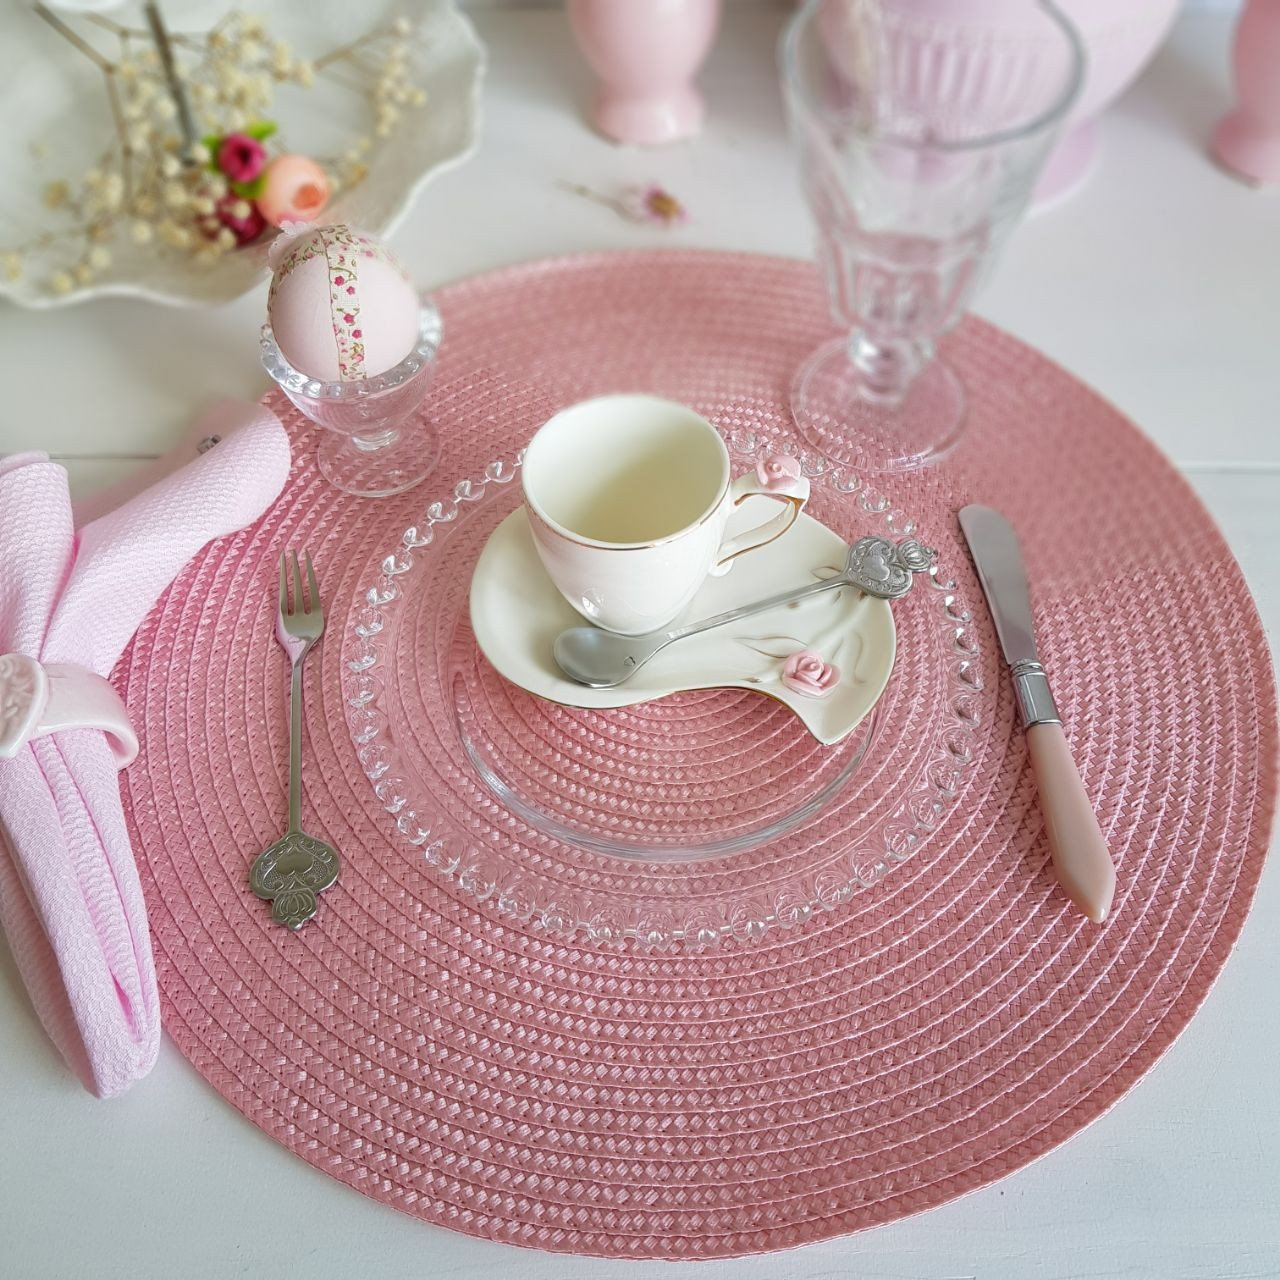 americano redondo trama individual rosa 38cm gzt casa cafe e mel 2